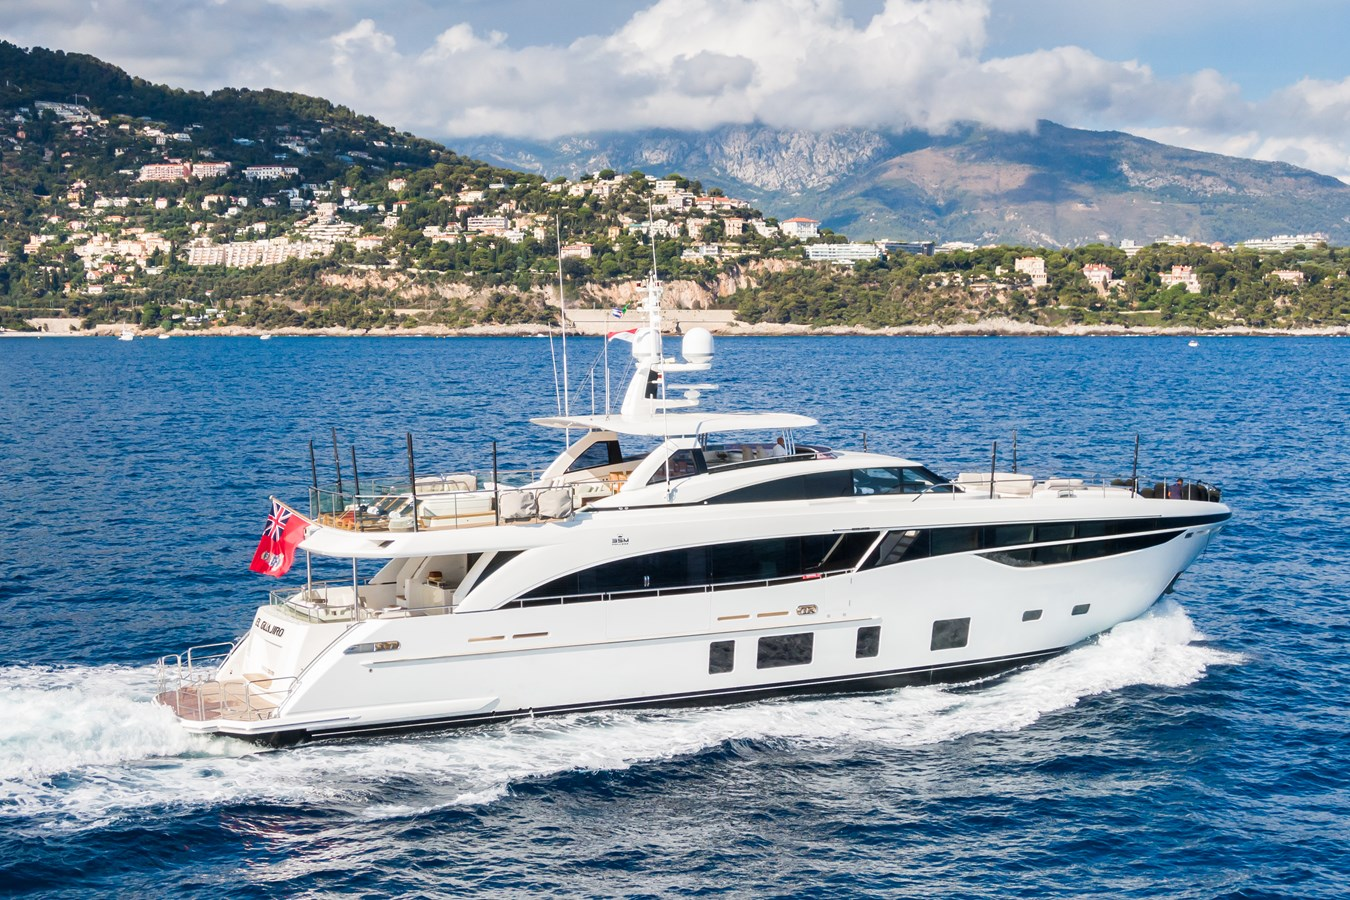 El Guajiro yacht for sale